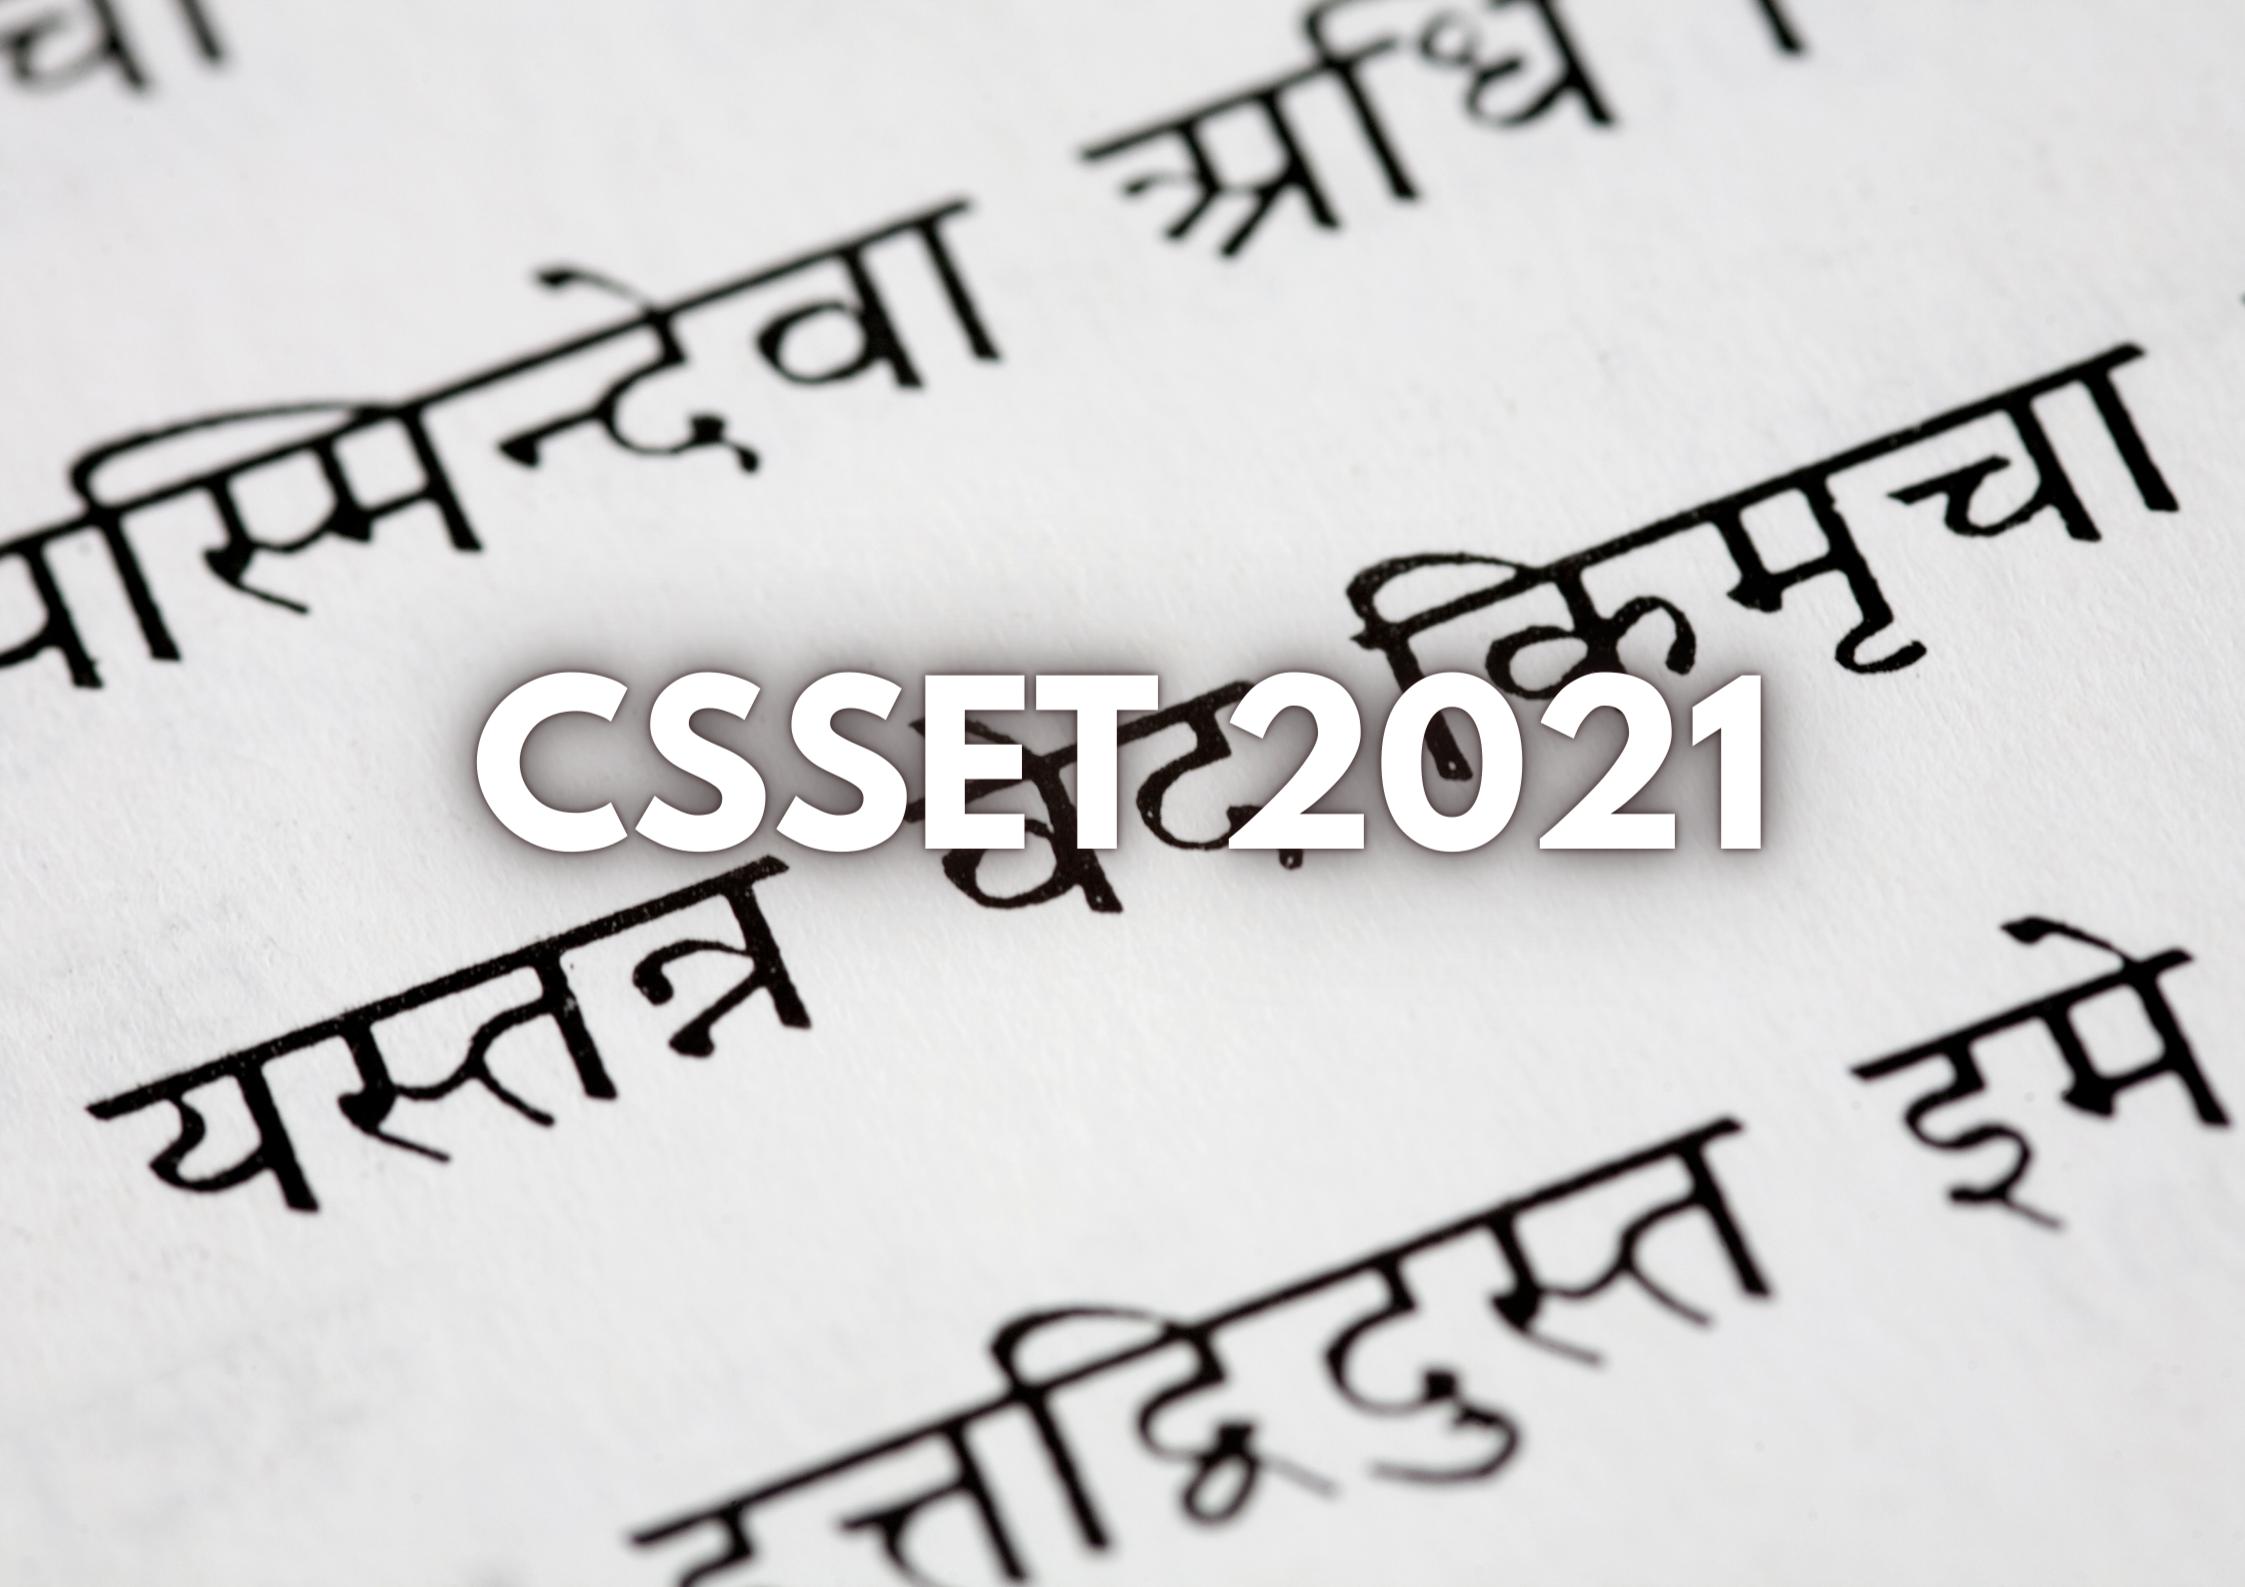 CSSET 2021 Notification: Registration, Dates(Tentative), Admit Card, Pattern and Syllabus